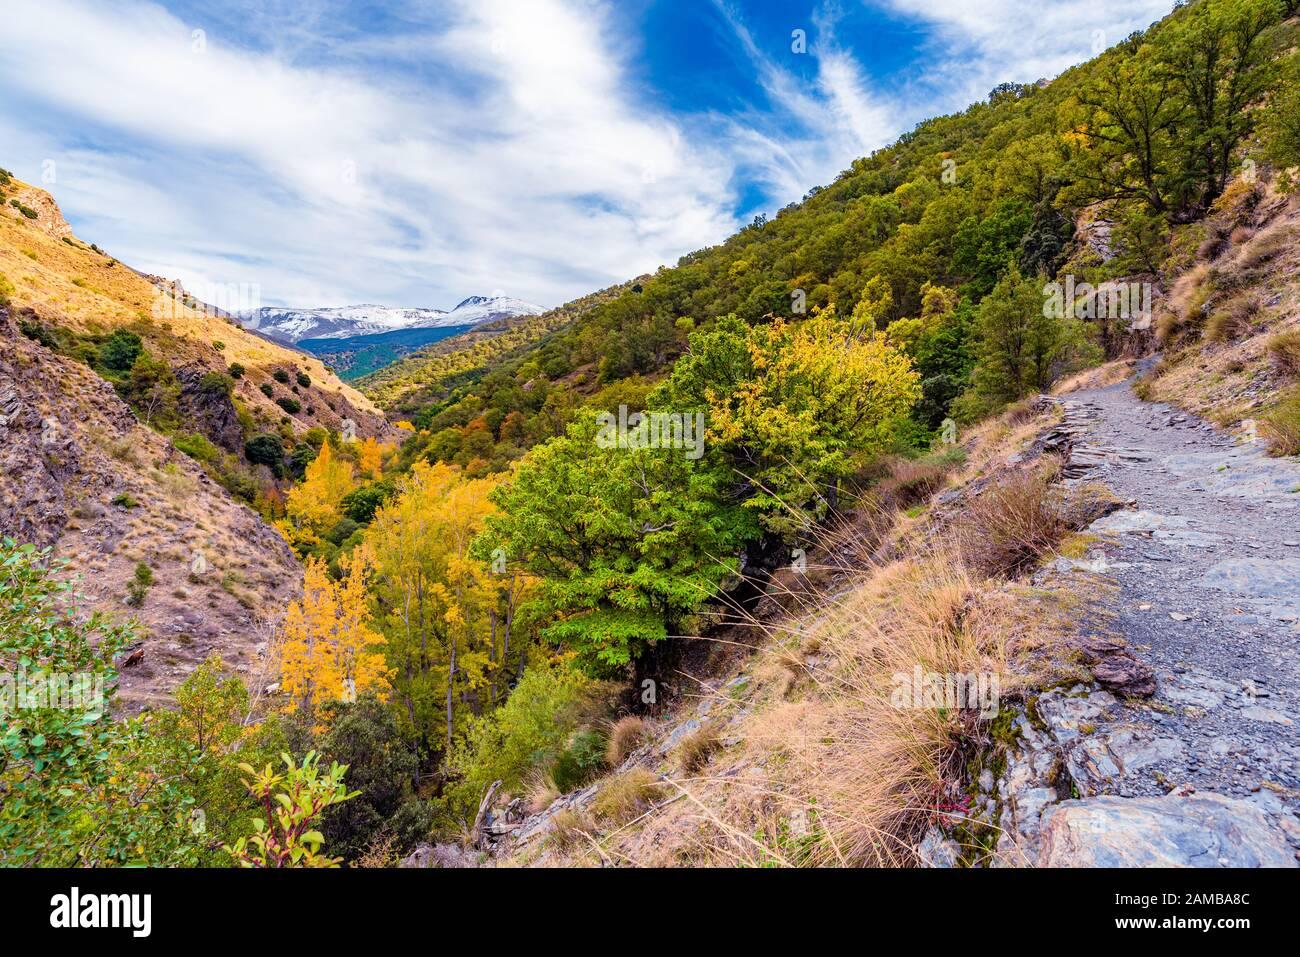 gjar-sierra-spain-october-27-2019-beautiful-view-from-the-hiking-trail-vereda-de-la-estrella-in-the-natural-park-of-sierra-nevada-2AMBA8C.jpg